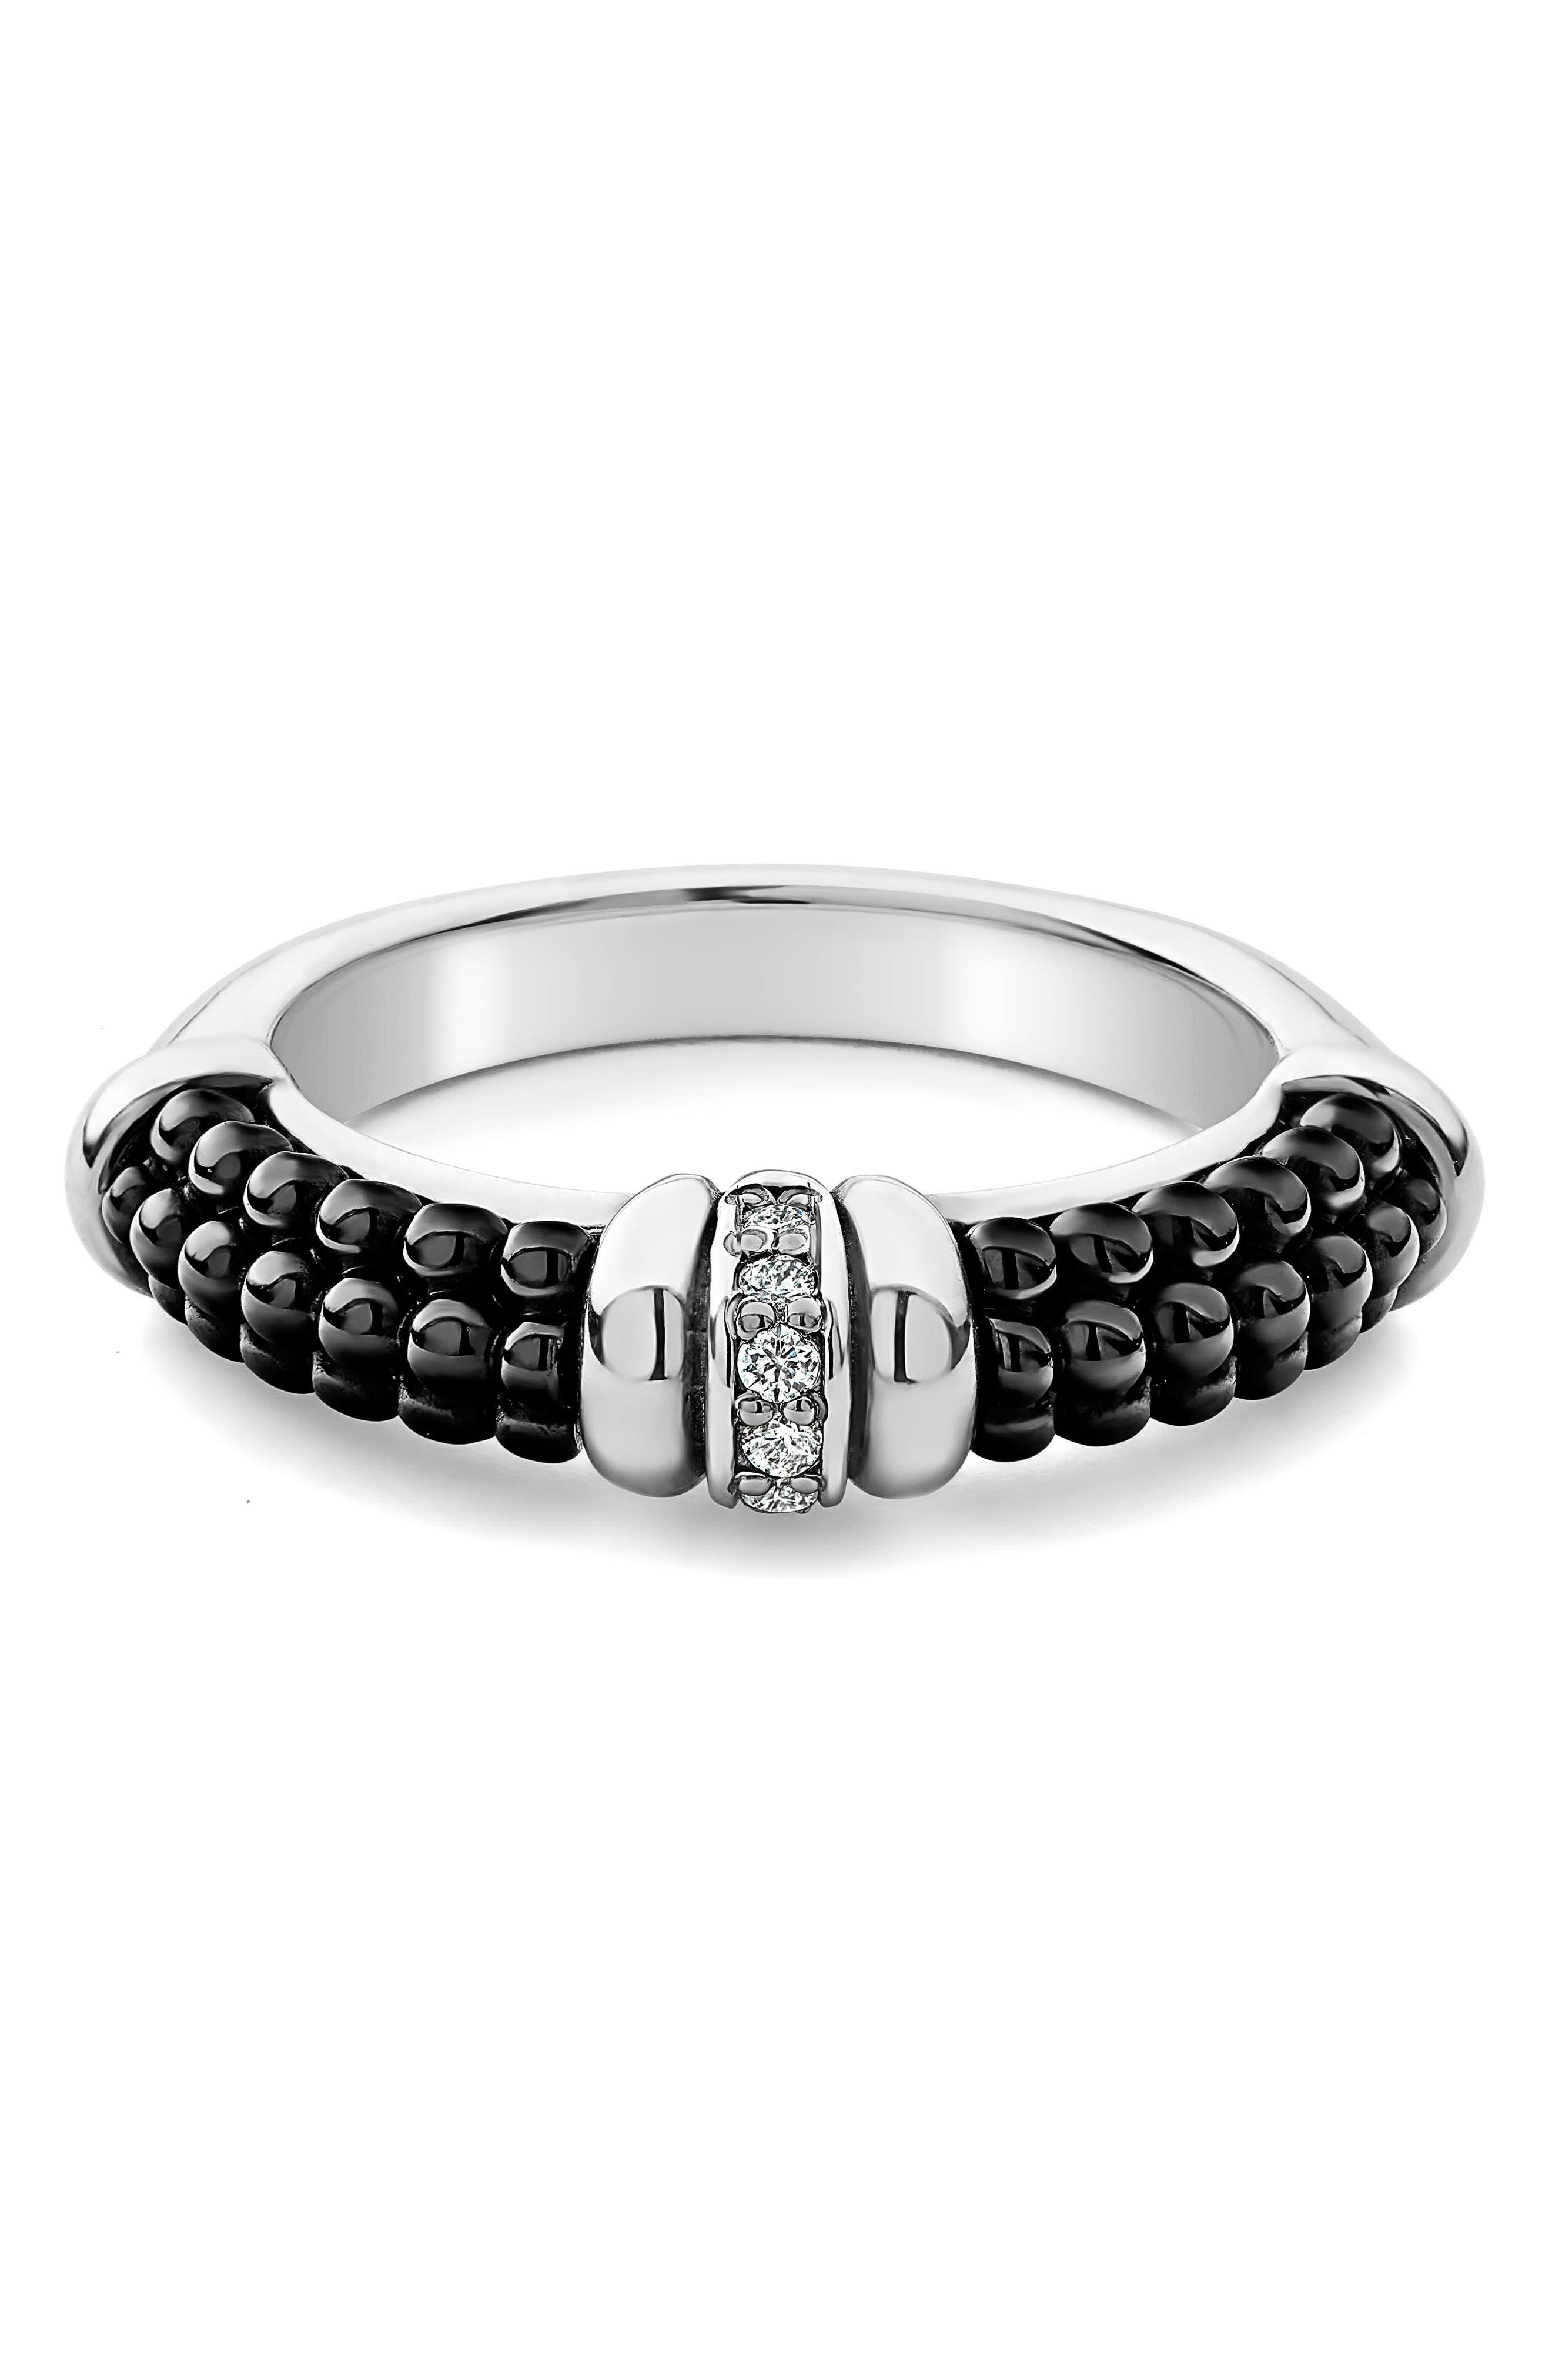 Black Caviar Diamond Stack Ring,                             Alternate thumbnail 5, color,                             SILVER/ BLACK